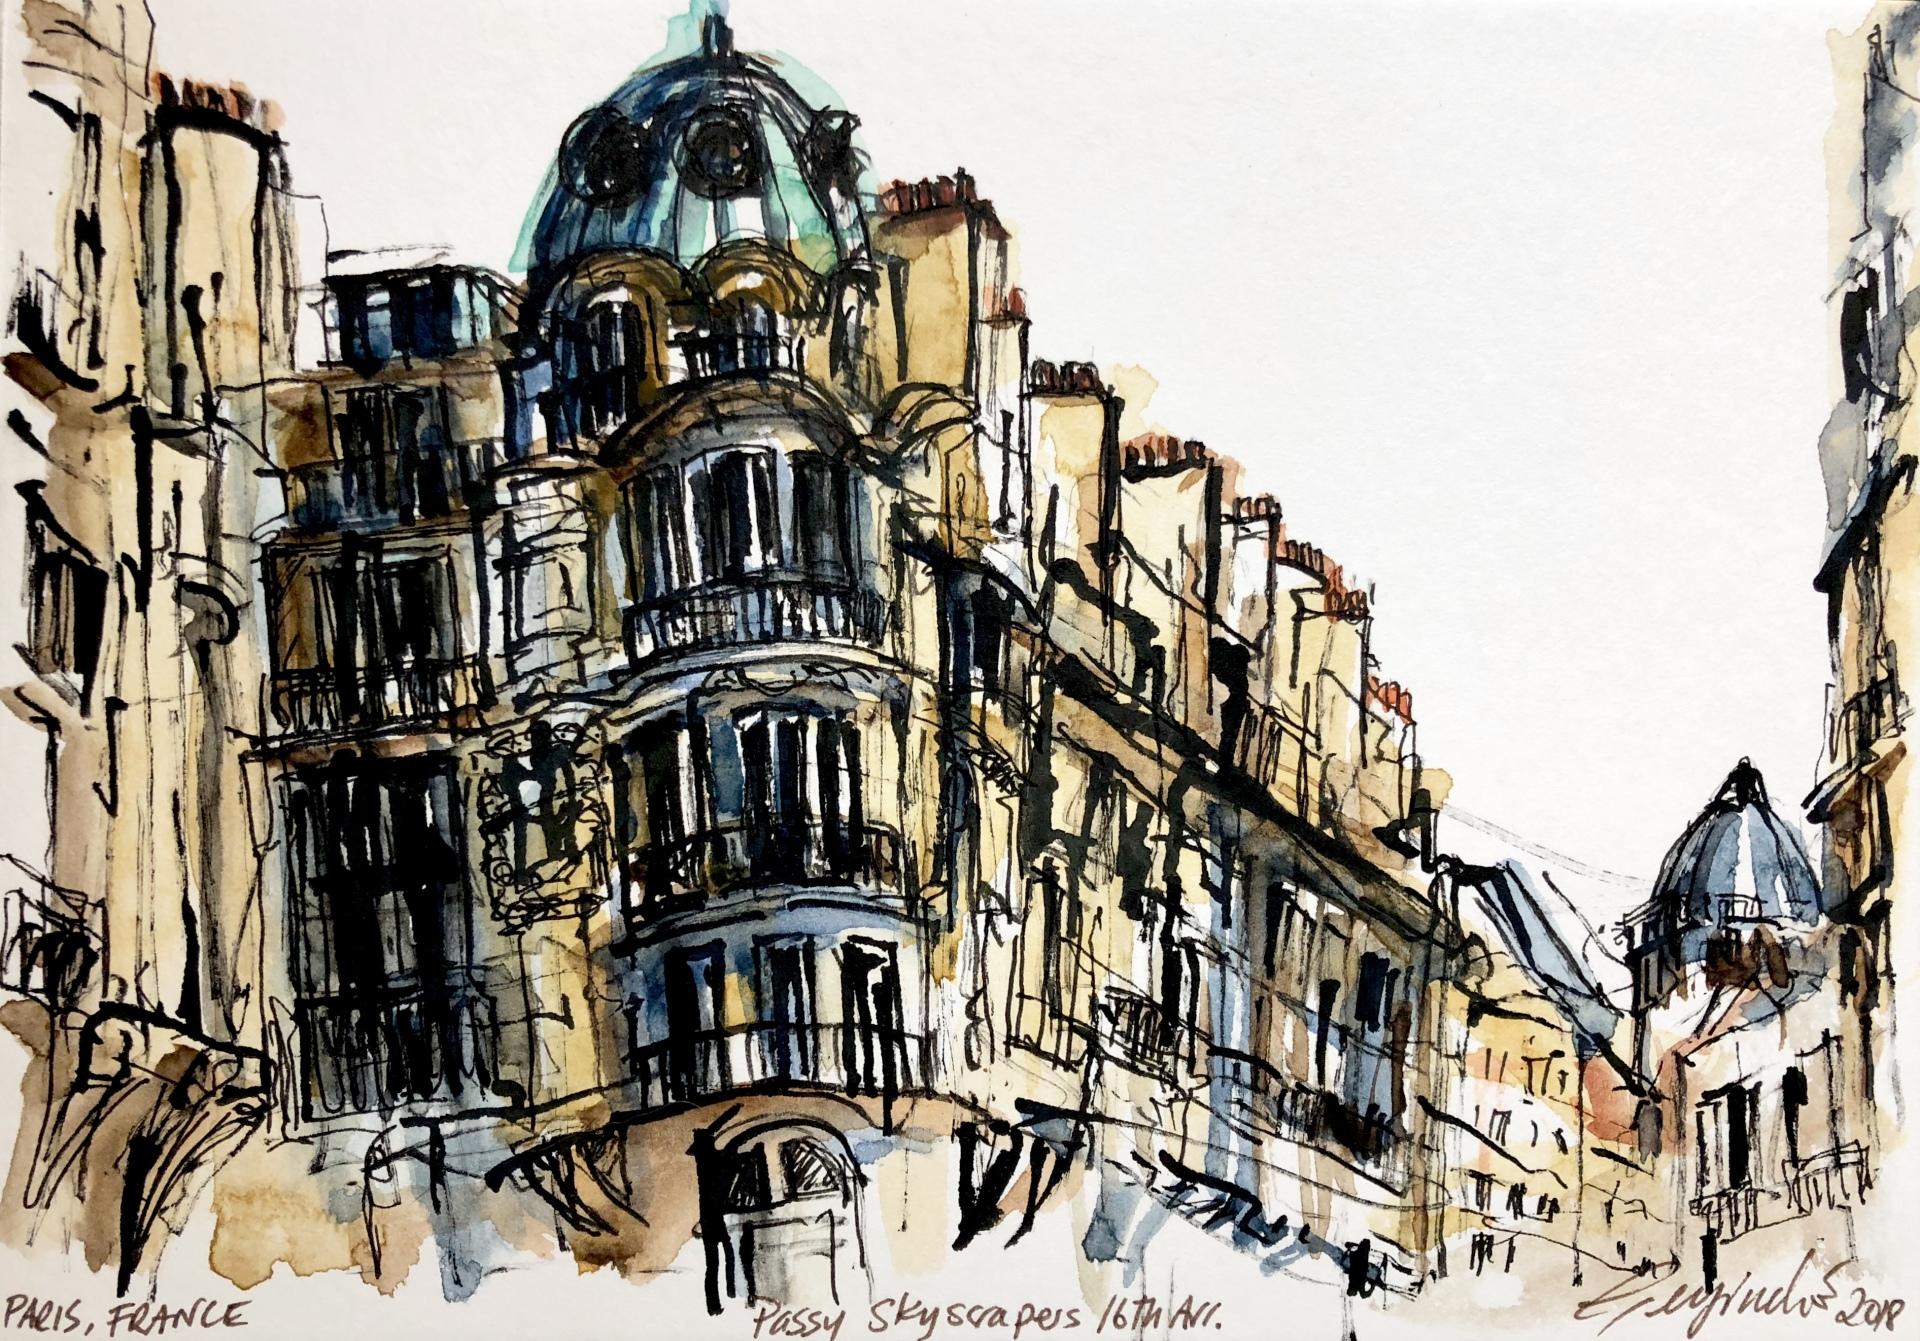 Wandering 16th Arrondissement, Paris (SOLD)